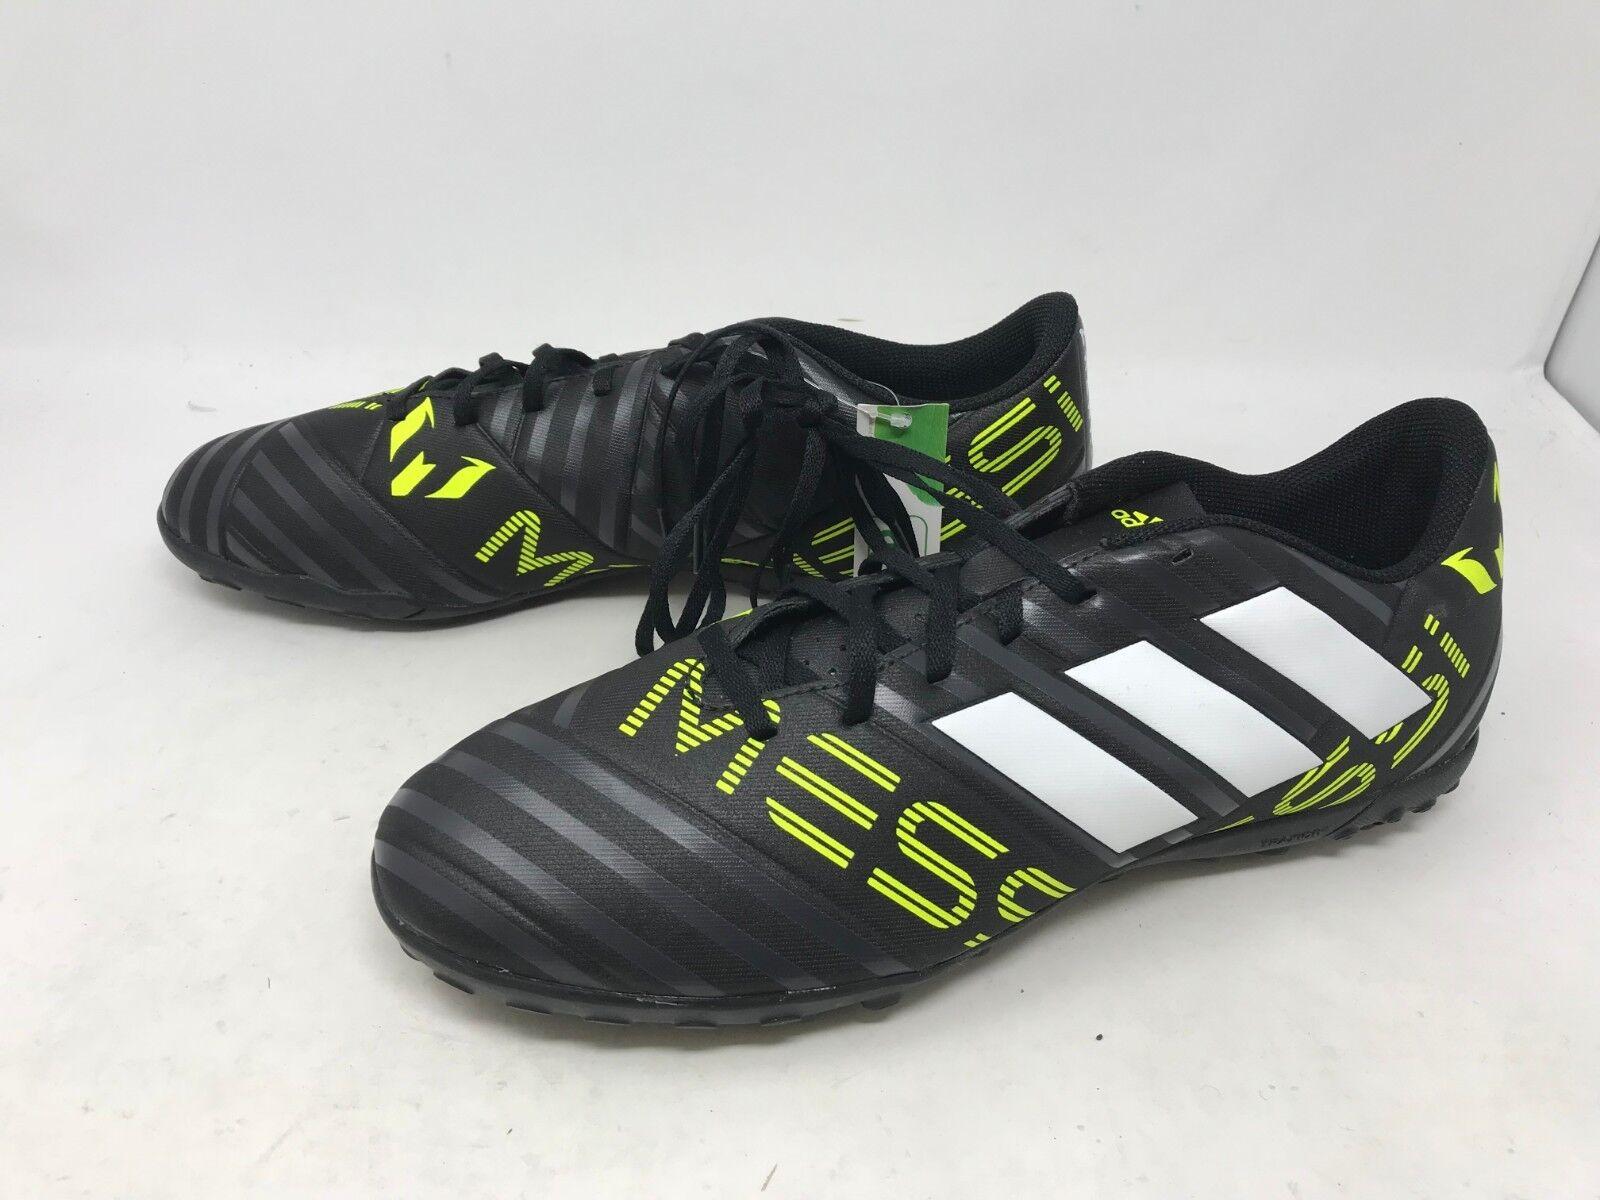 Mens Adidas  Nemeziz Messi 17.4 Turf Soccer Shoes 438m